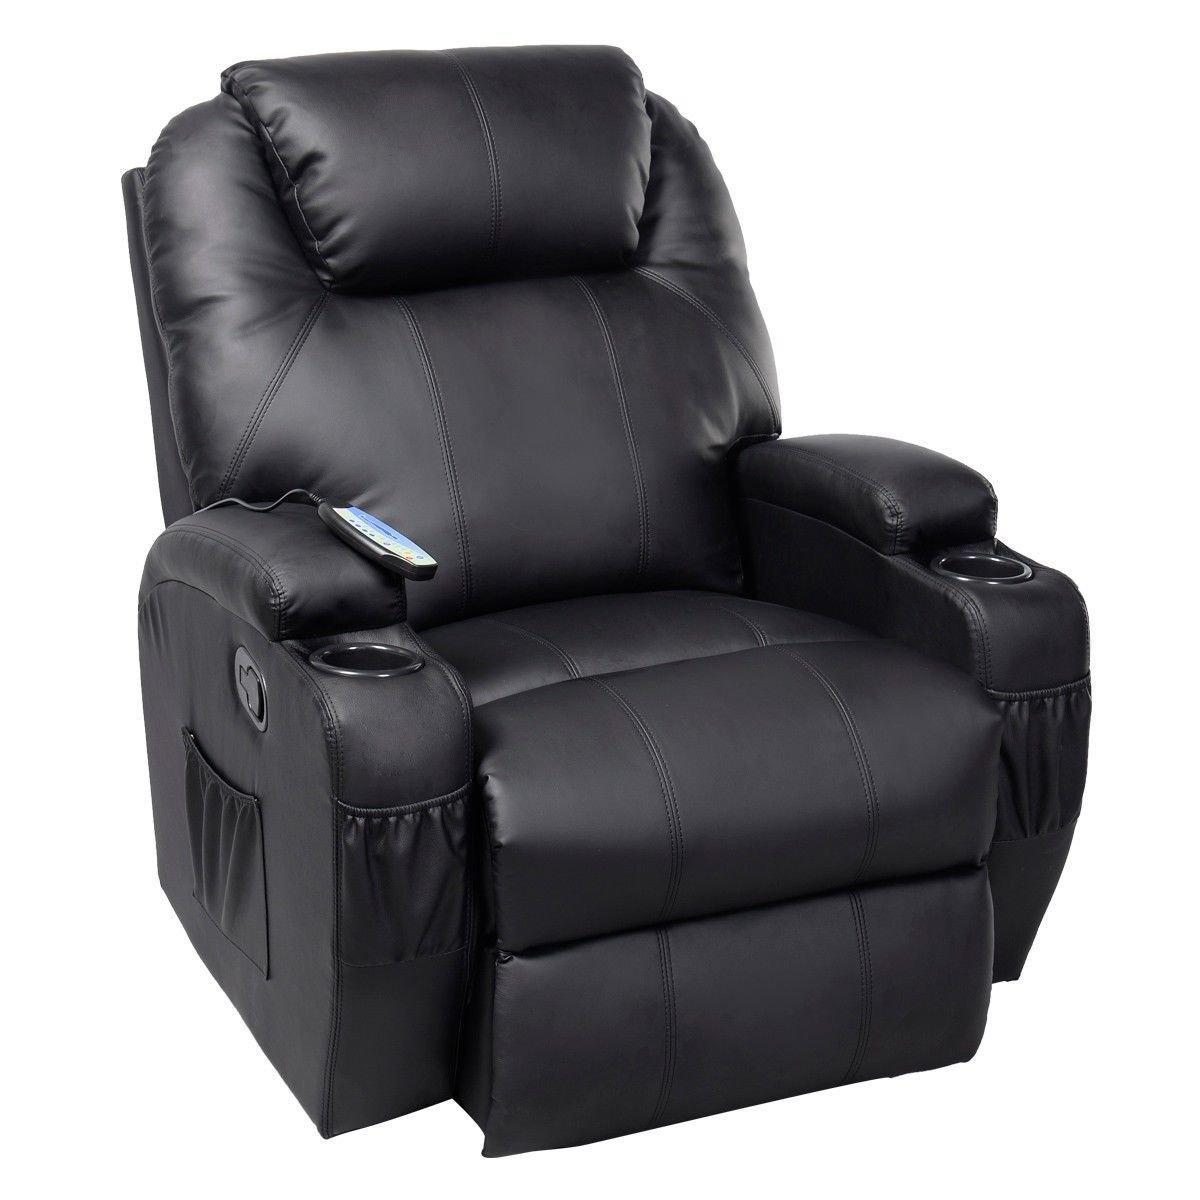 GHP Black Sturdy Ergonomic Seating Massage Recliner Sofa Chair Lounge Heated w Control